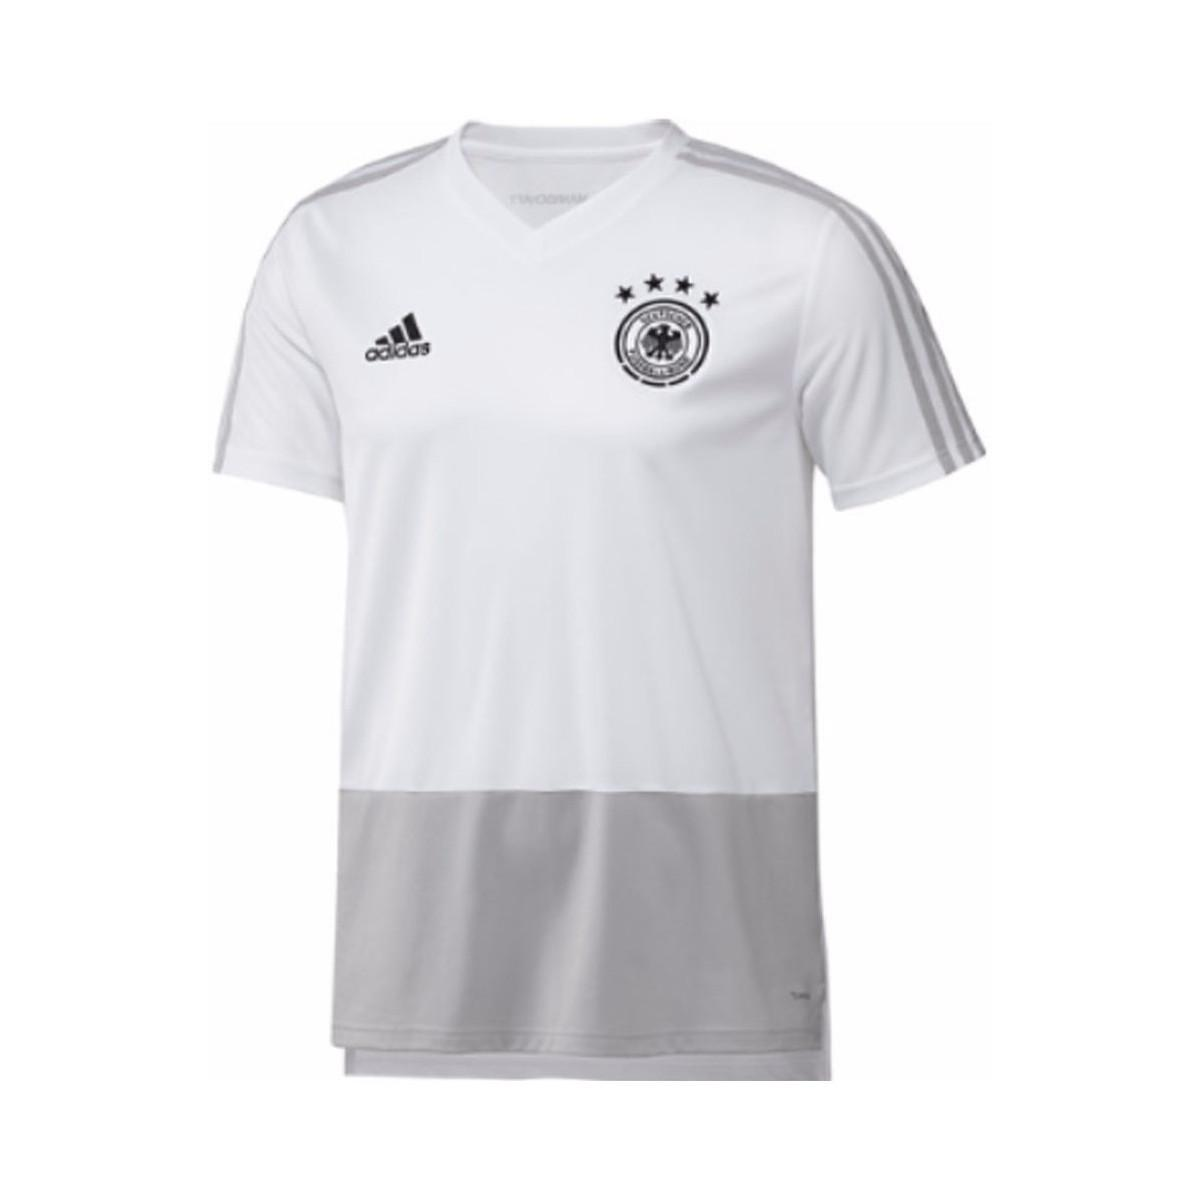 221507806 adidas 2018-2019 Germany Training Shirt Men s T Shirt In White in ...